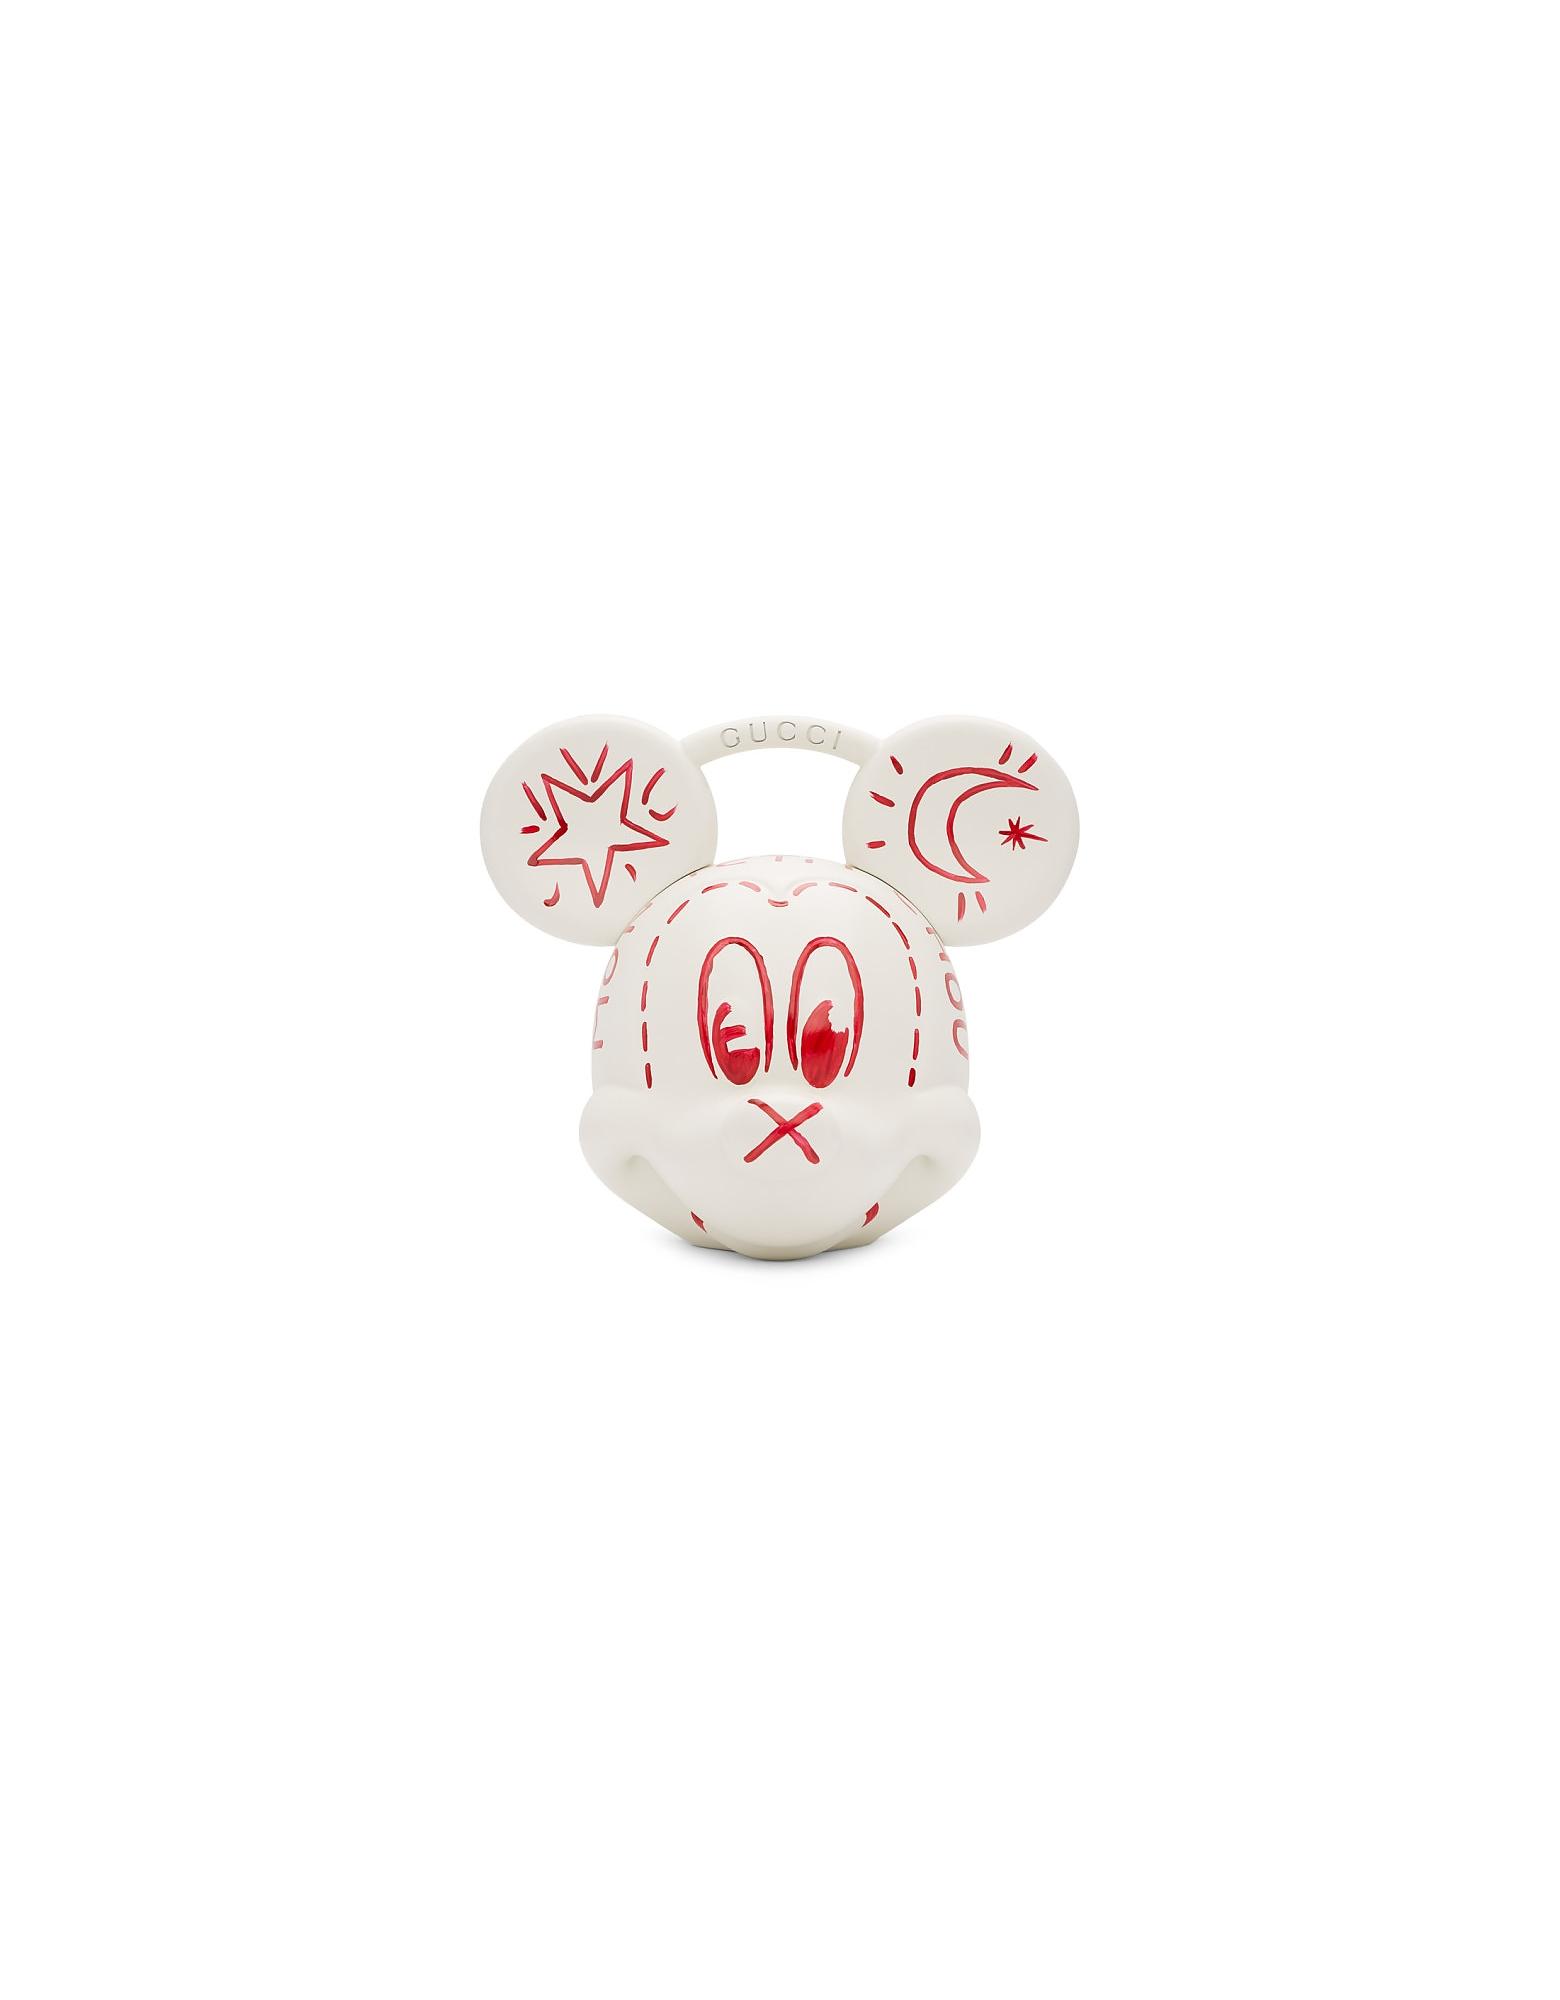 Gucci Designer Handbags, White Disney Edition Mickey Mouse Top Handle Bag